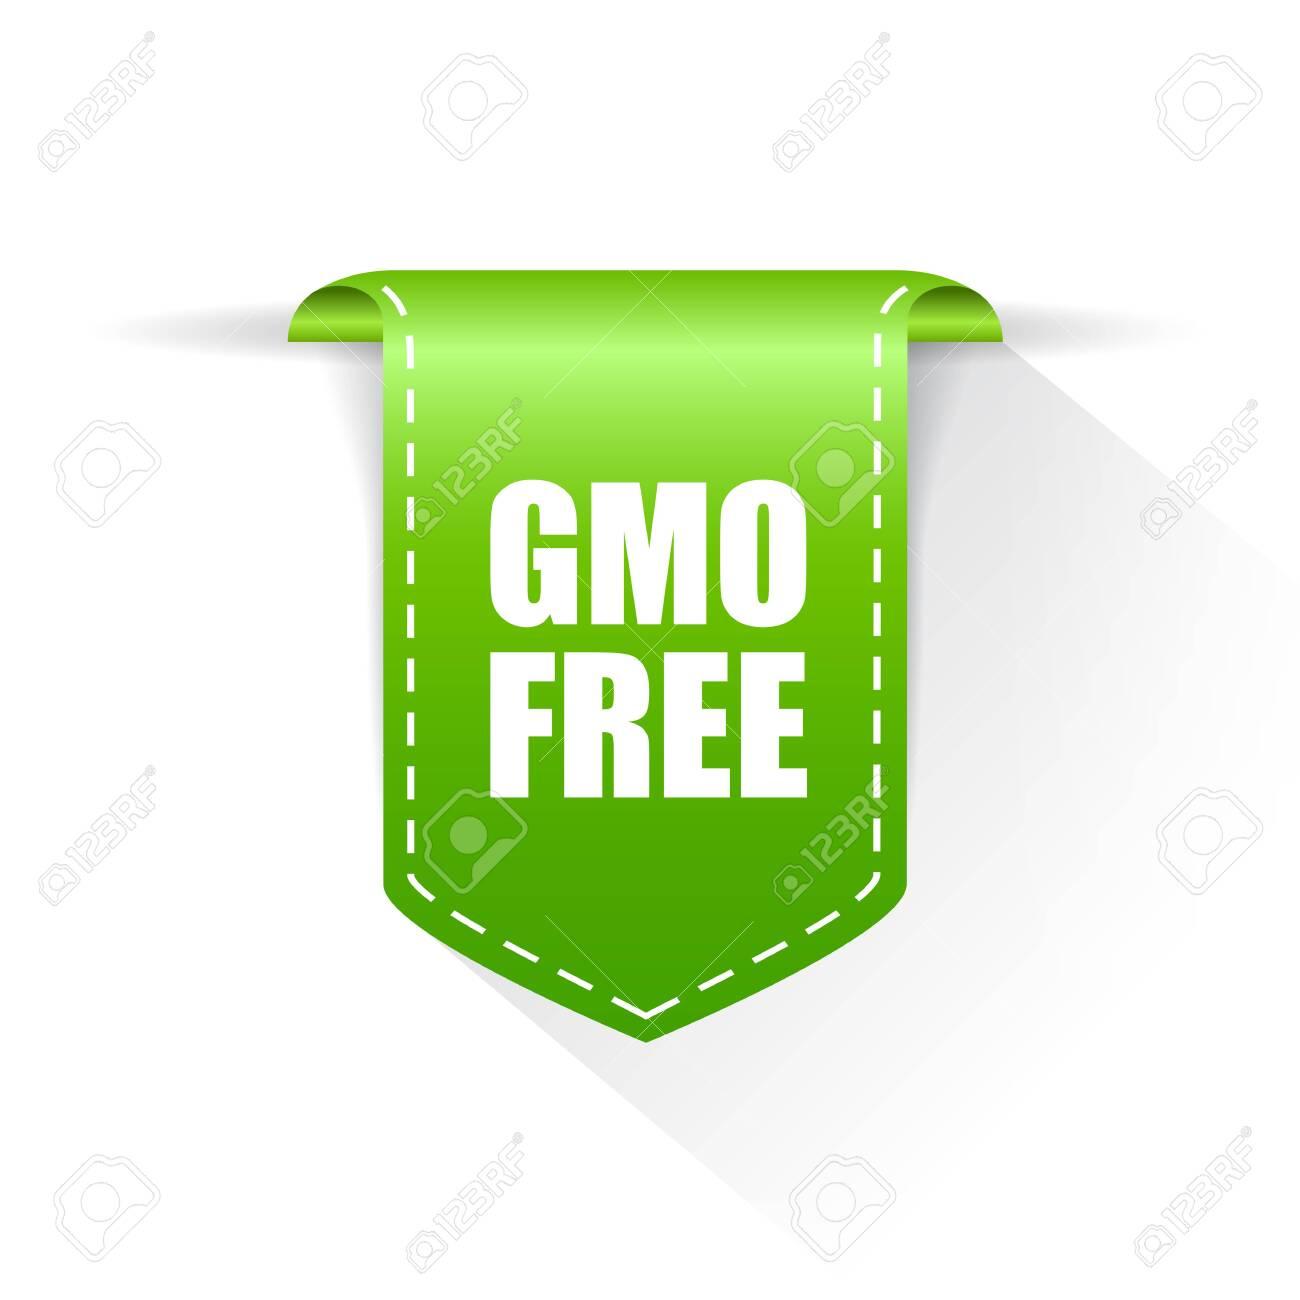 Gmo free green label on white background - 146312819